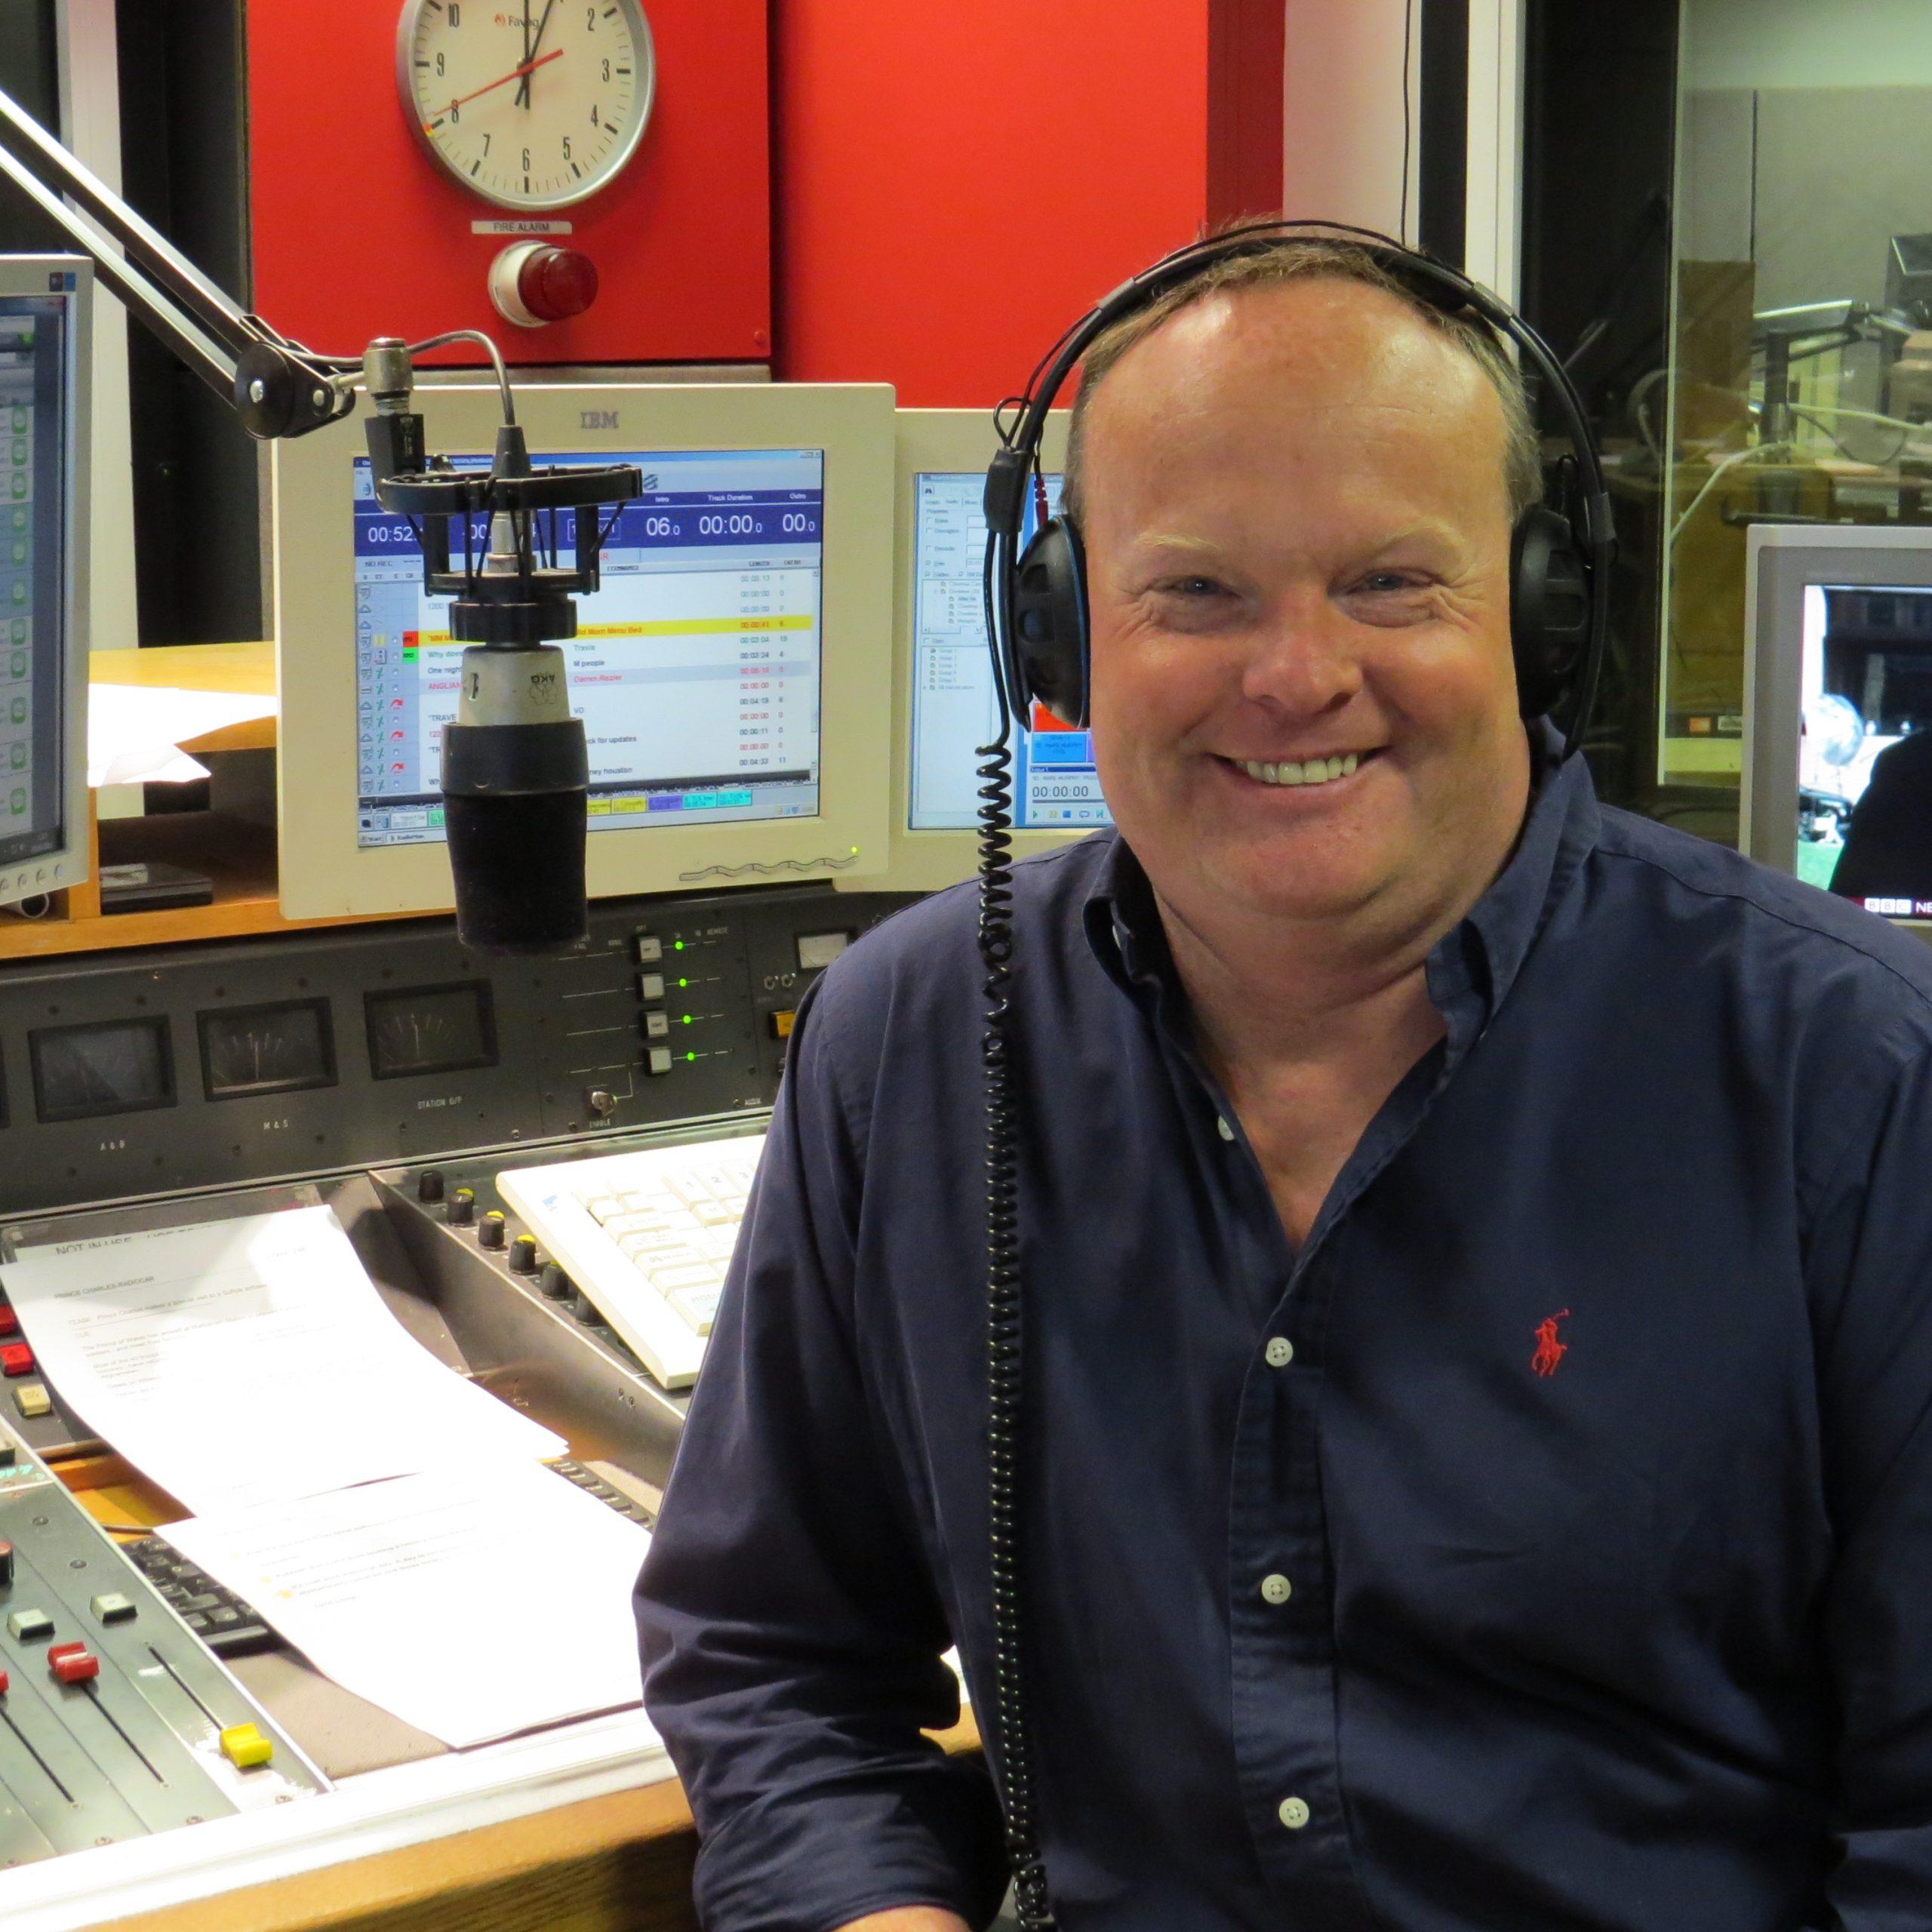 Mark Murphy, presenter of Mid Morning show on BBC Radio Suffolk